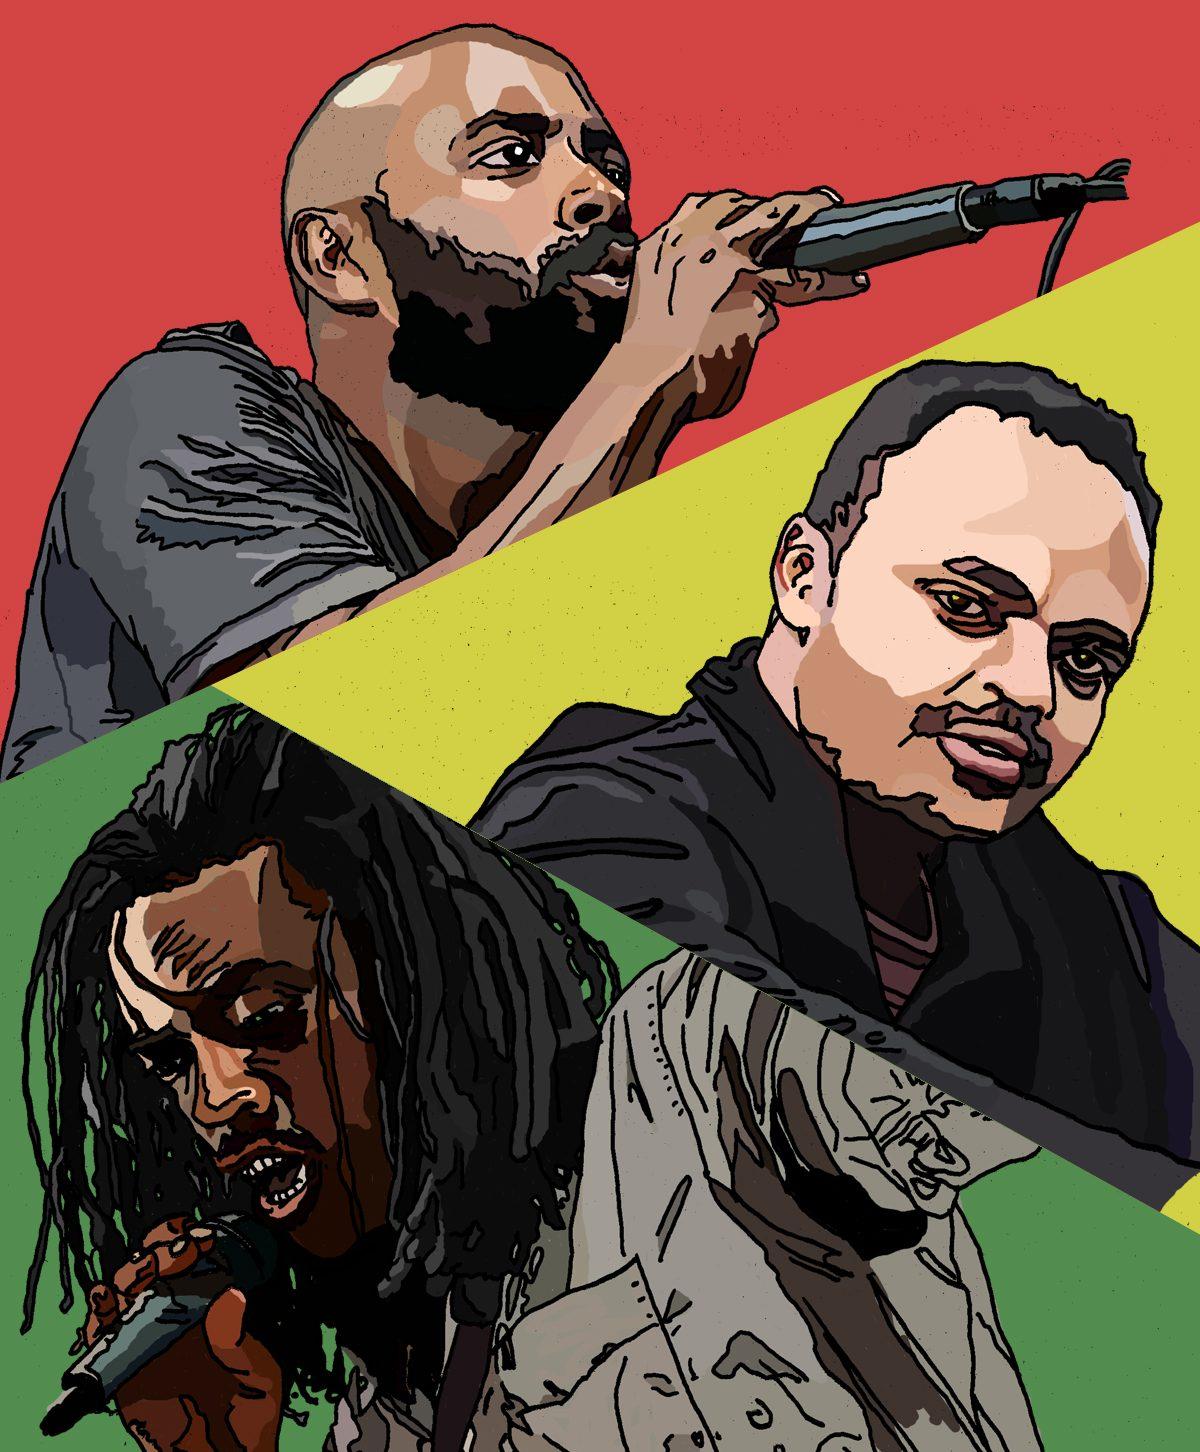 Zion Rebels